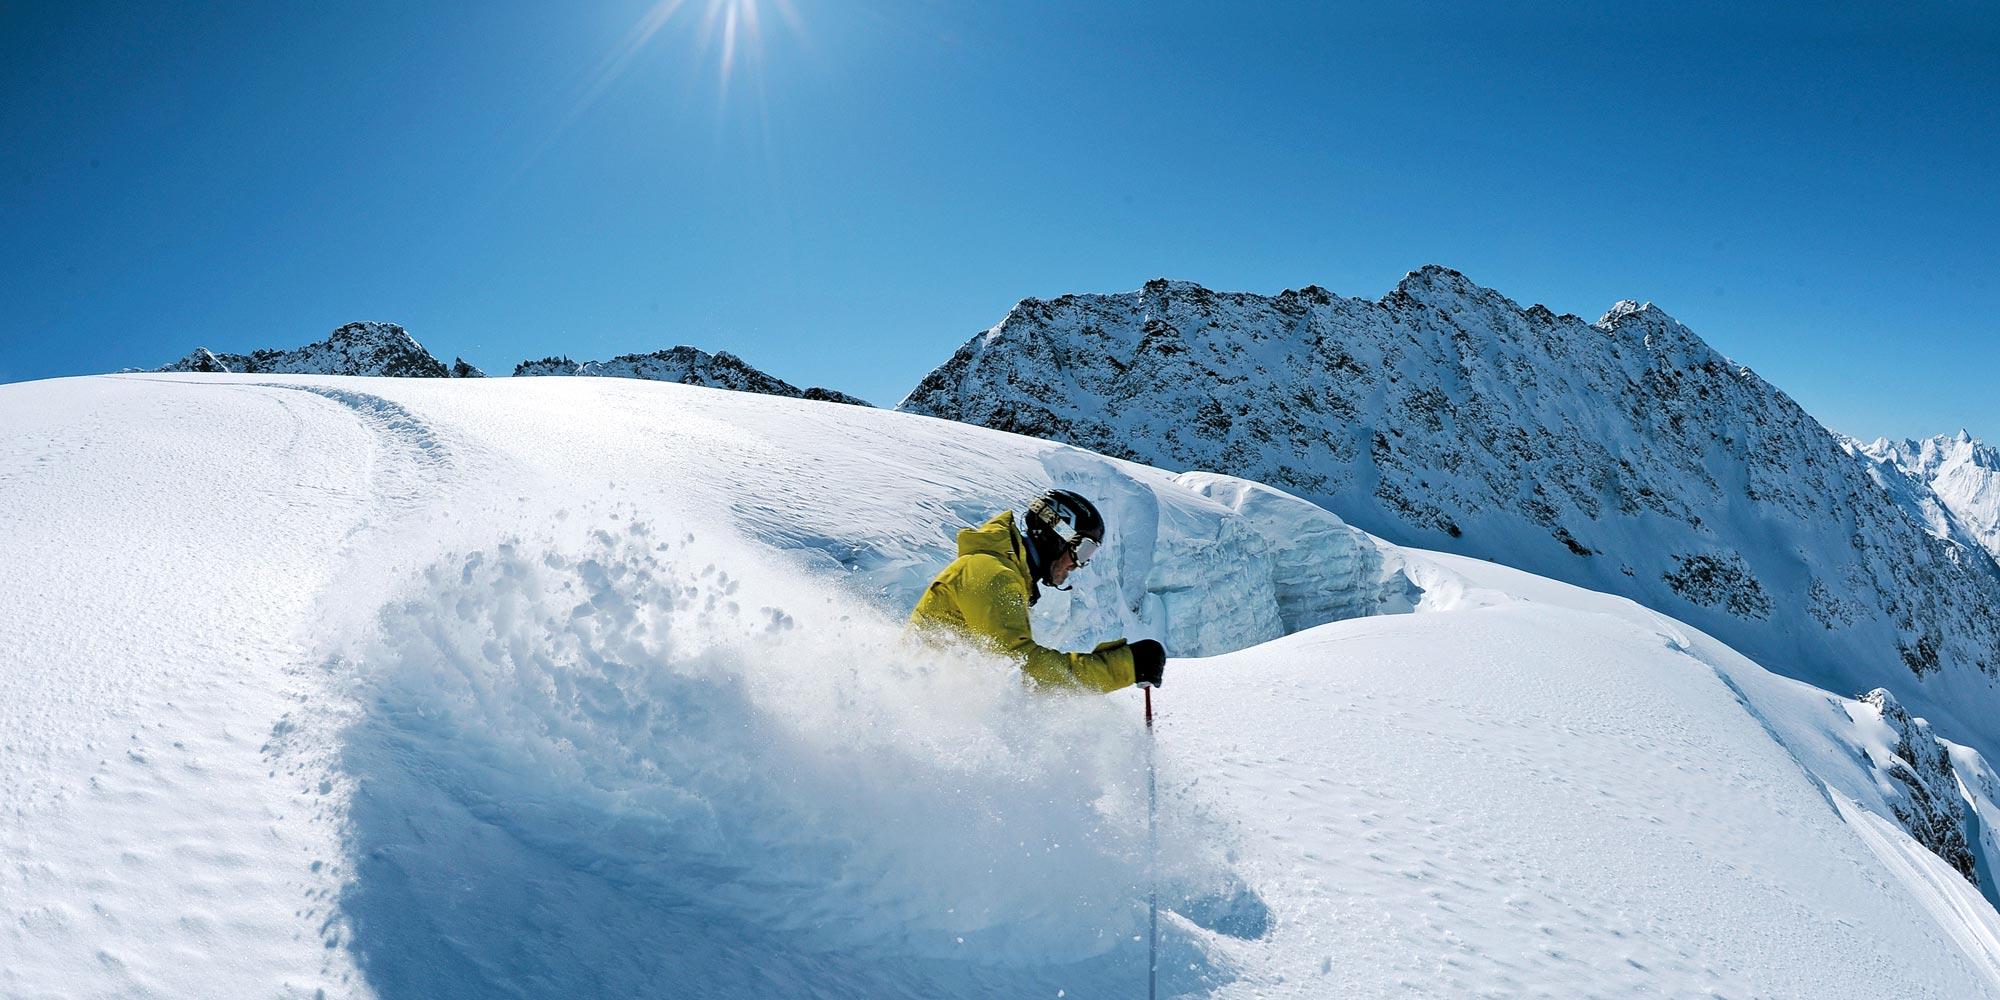 soel_skifahren_02_12_2000x1000